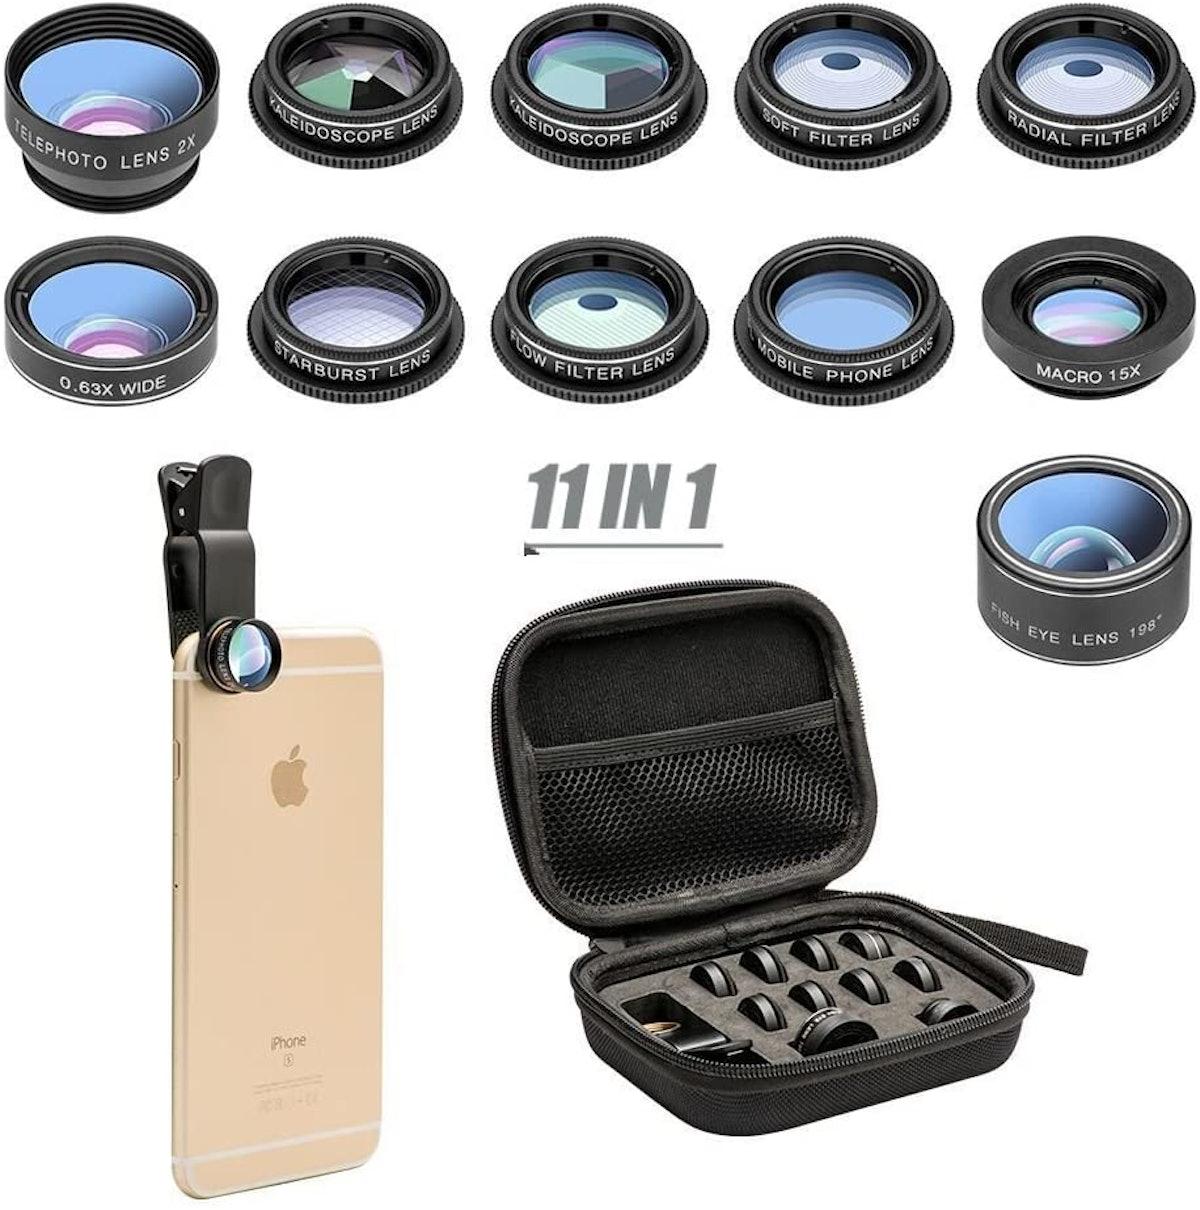 Mocalaca Smartphone Lens Kit